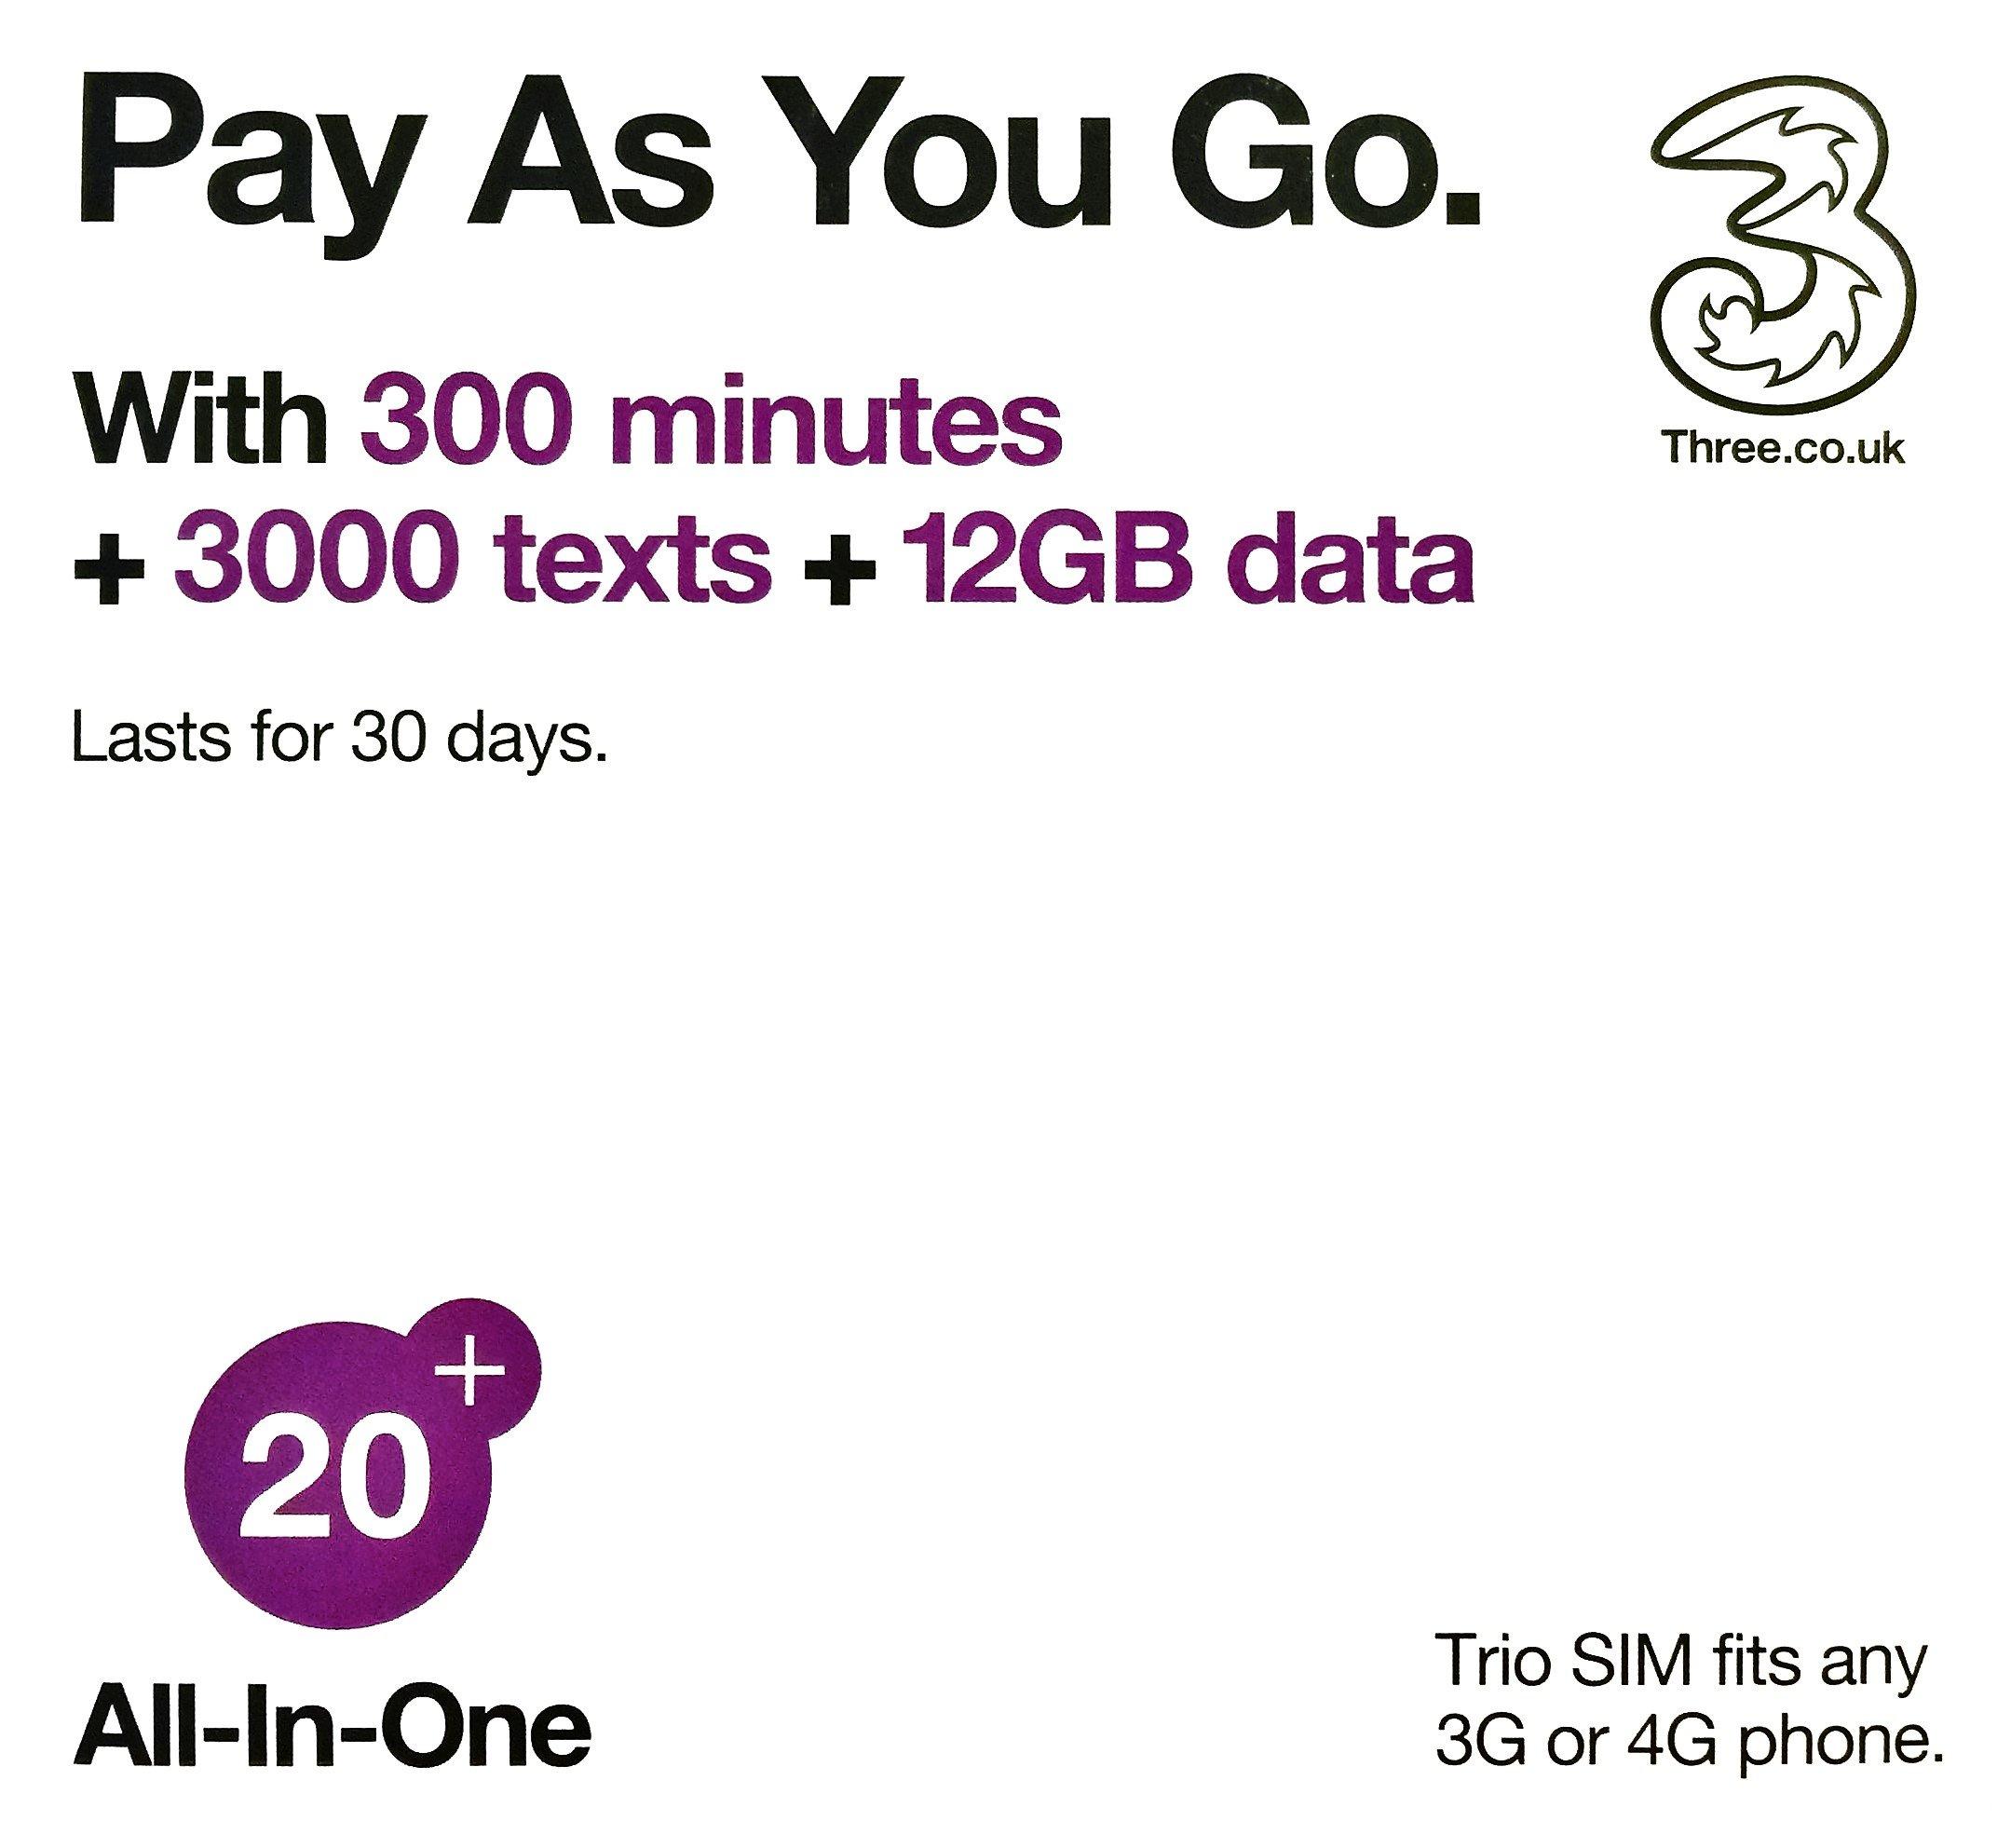 Europe (U.K.) prepaid sim with 42 countries - Three SIM Card with £20 Credit 300min+300texts+12GB data (Europe Prepaid Sim) 42 Destinations! 3 sim! by Three SIM